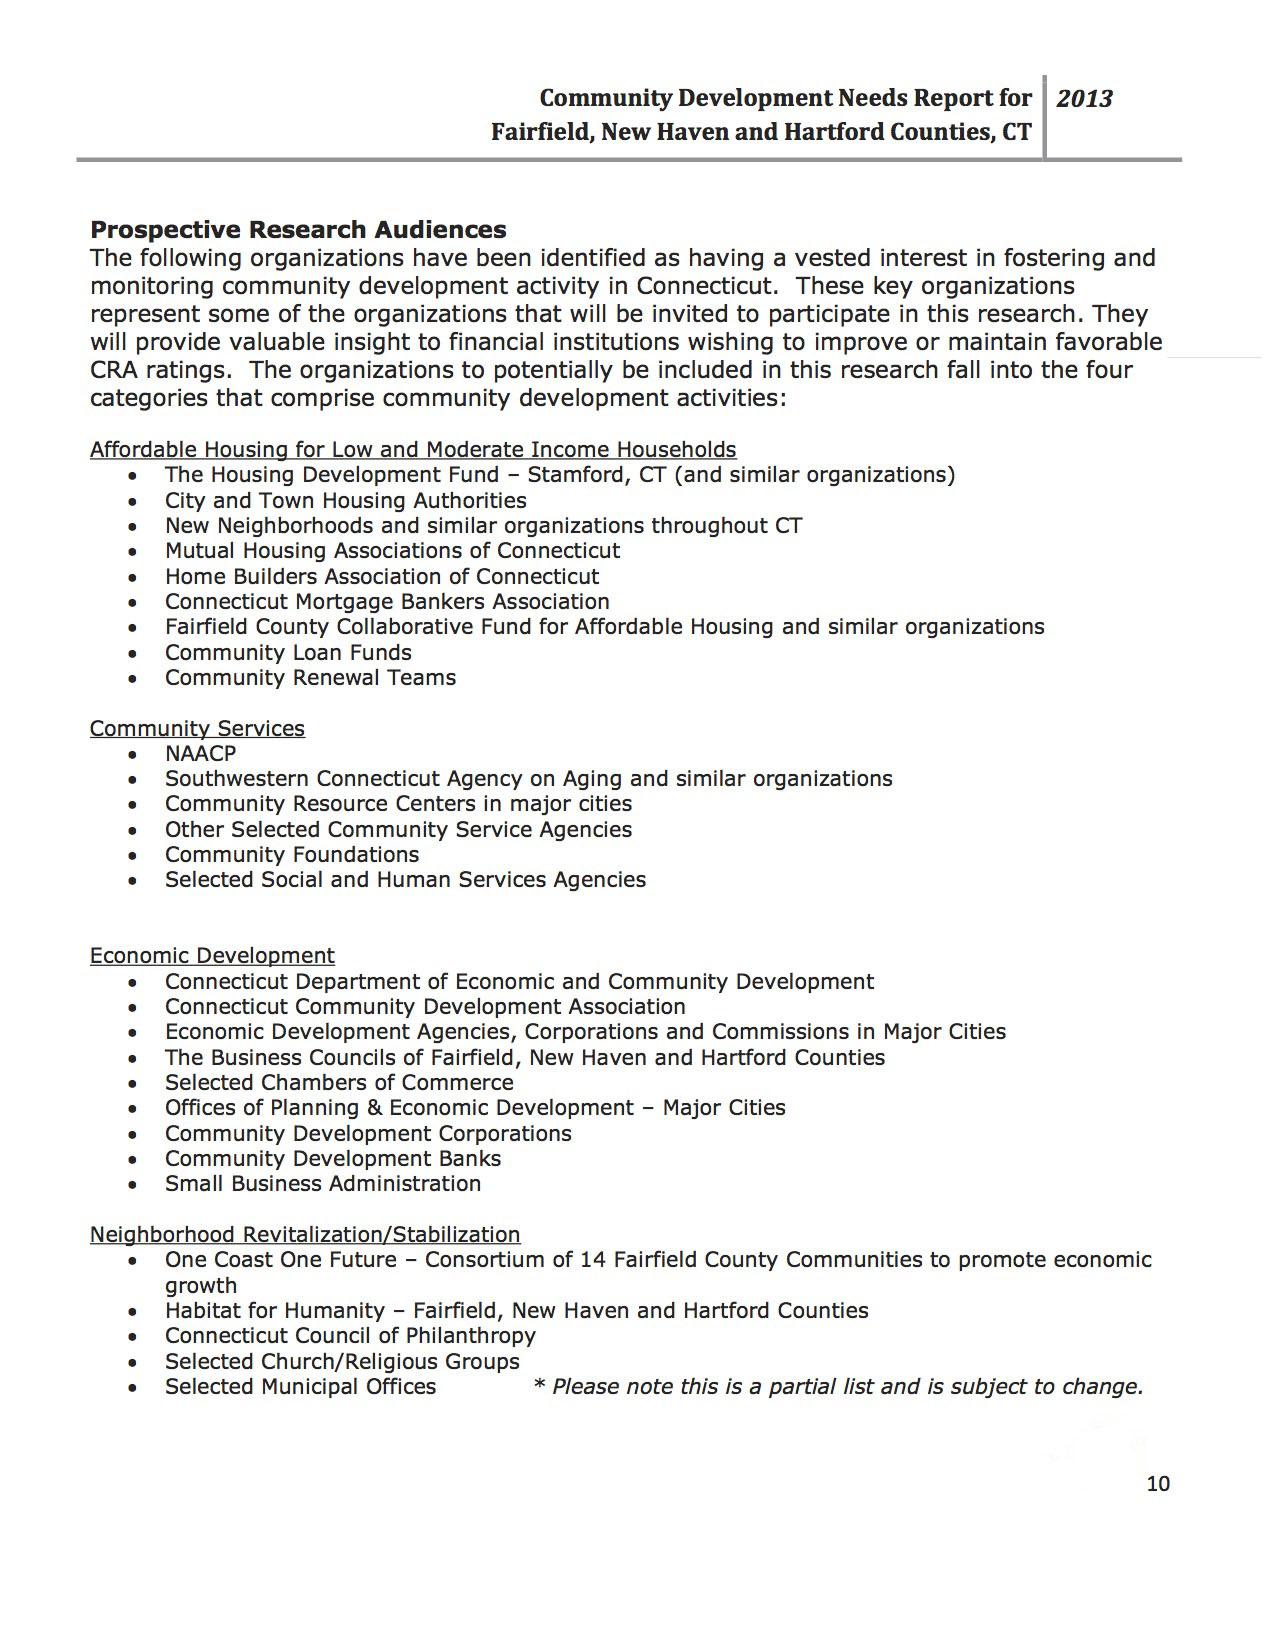 Community Needs Assessment Reports   GeoDataVision